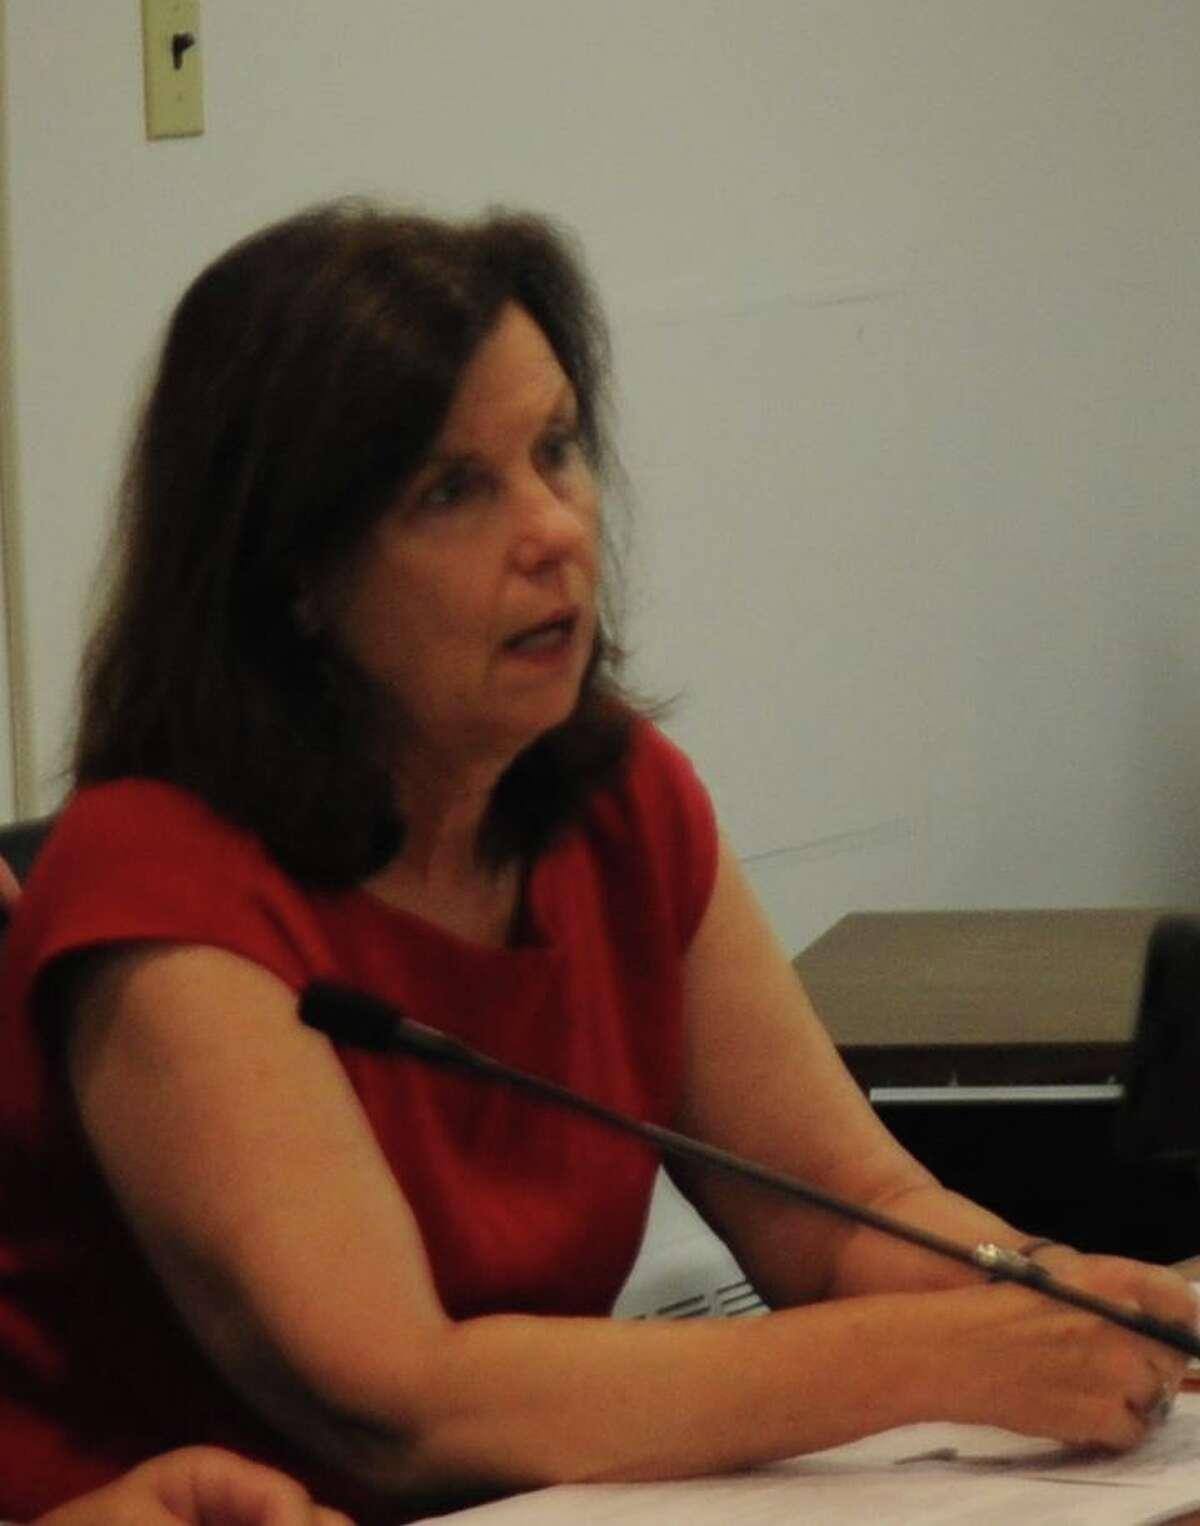 Selectwoman Maureen Kozlark will take over as the Board of Selectmen's representative to the WPCA.